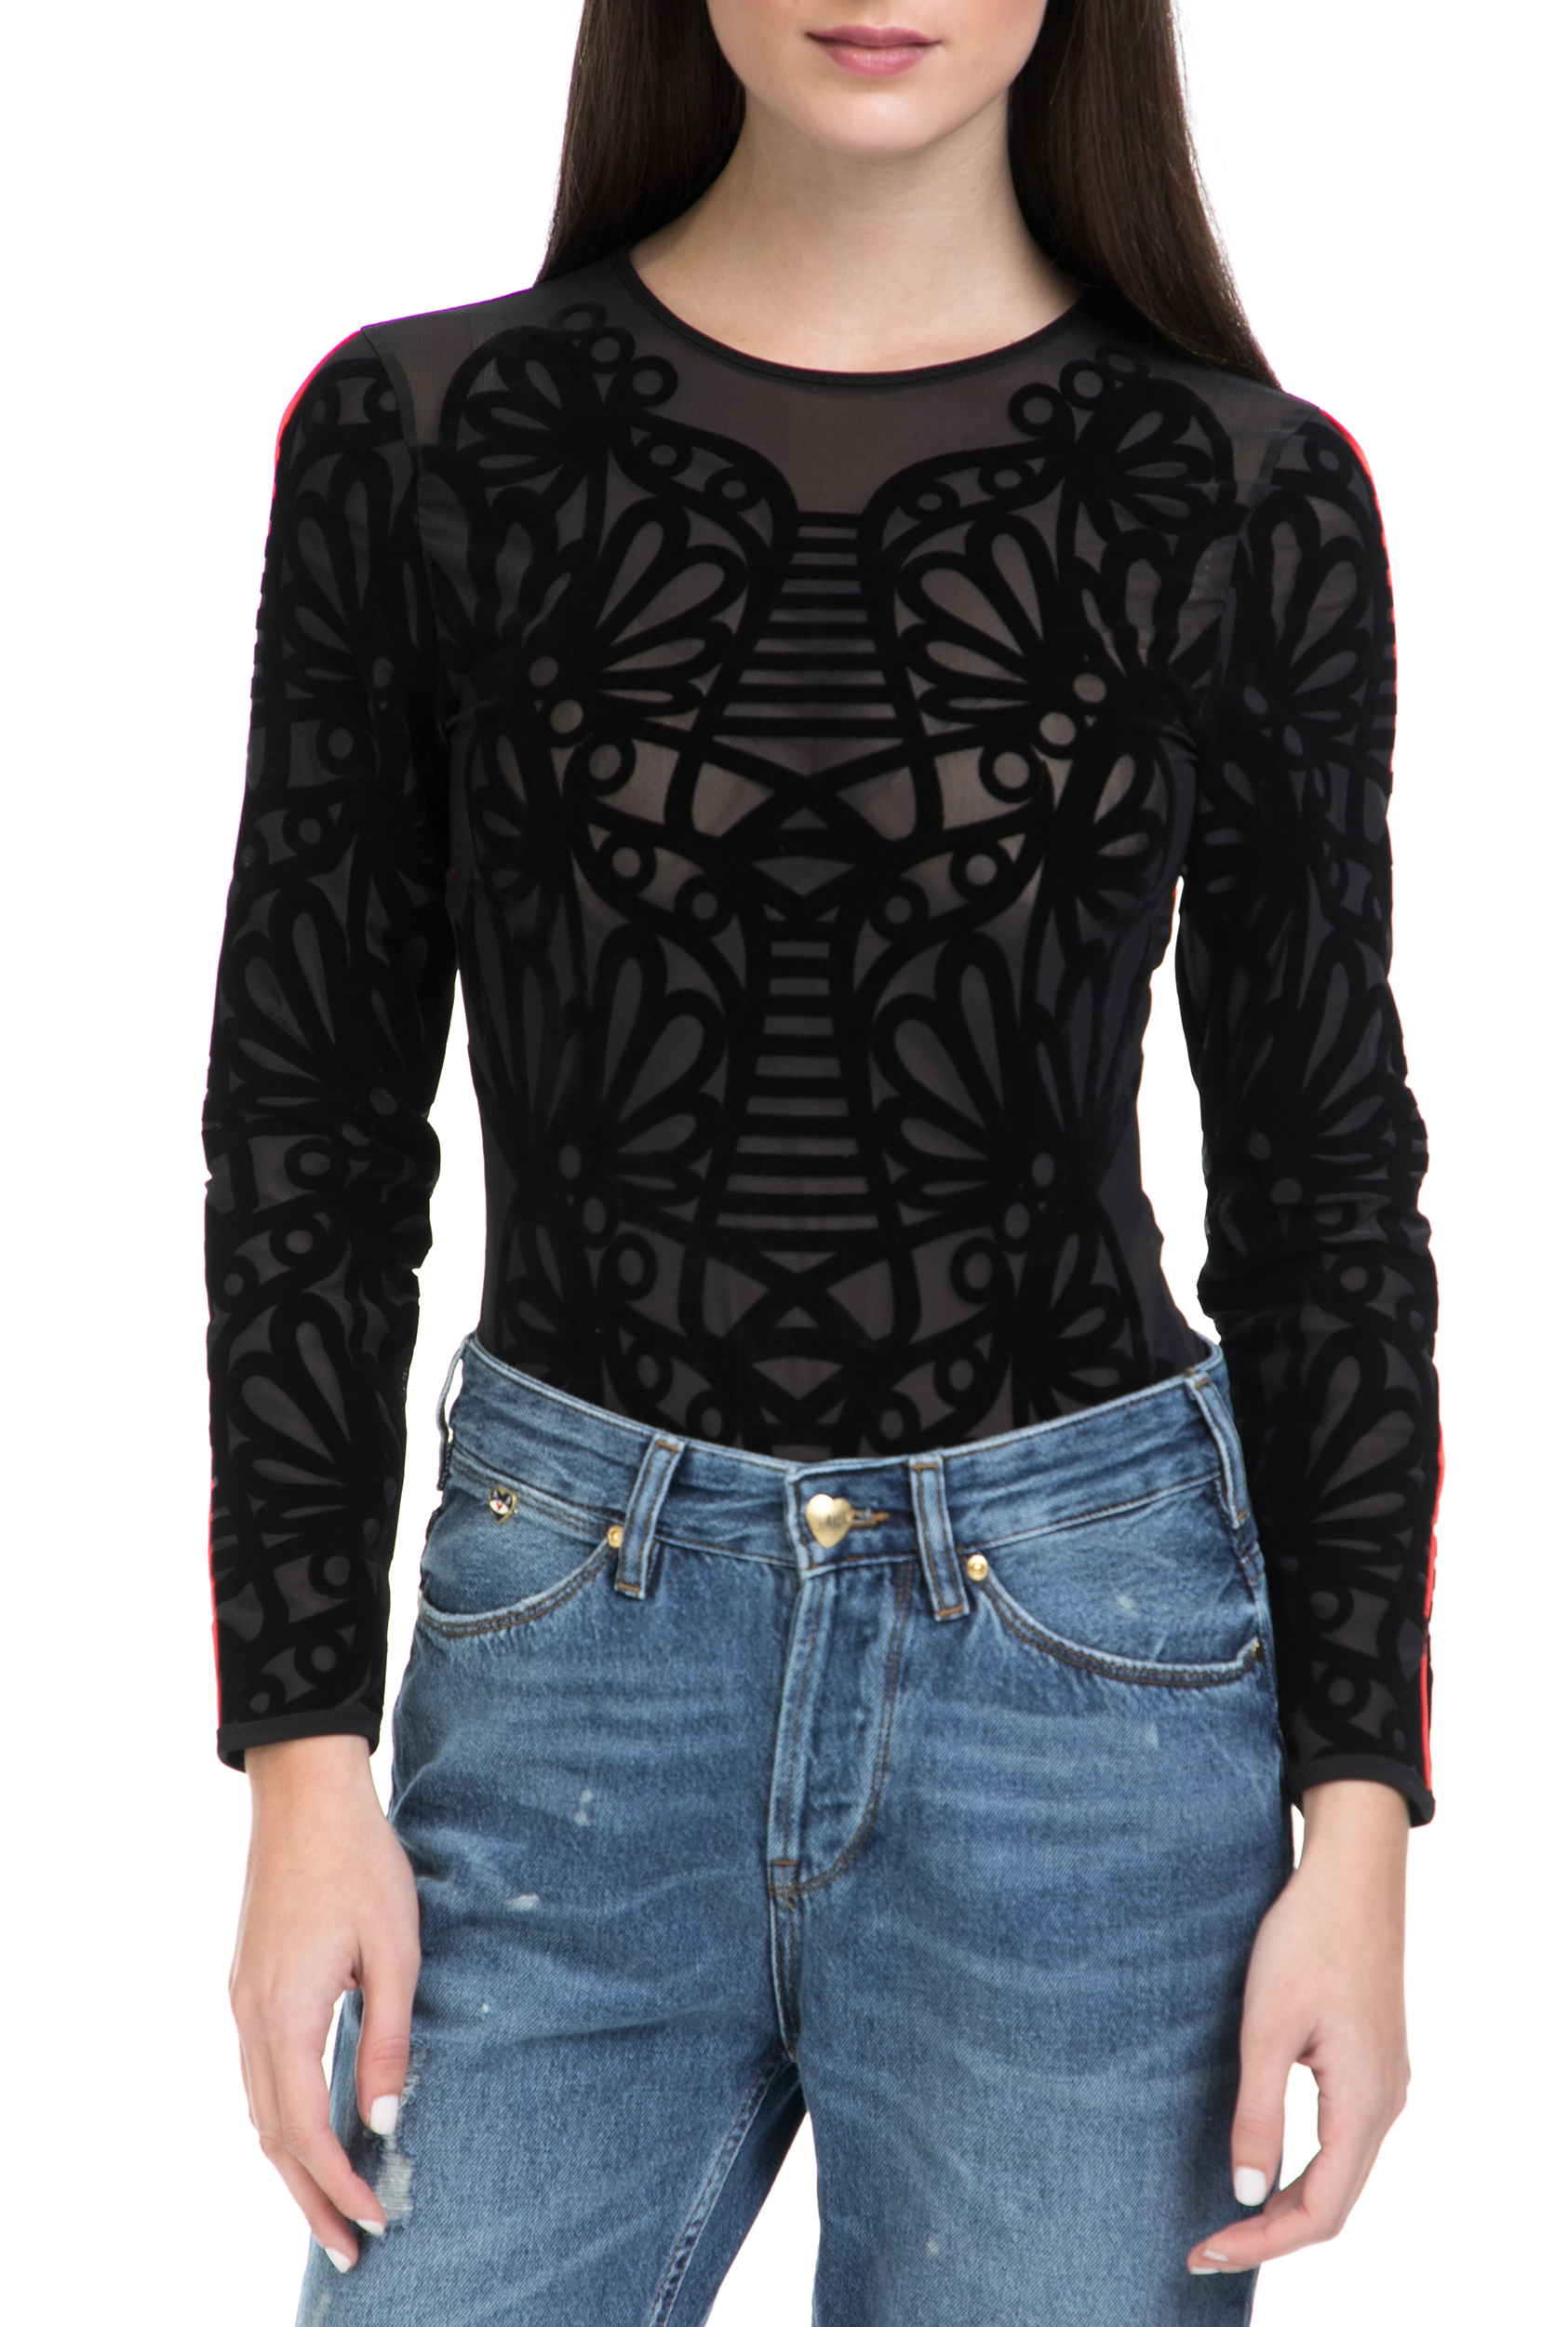 PUMA - Γυναικείο body PUMA x SW Bodysuit μαύρο γυναικεία ρούχα εσώρουχα κορμάκια